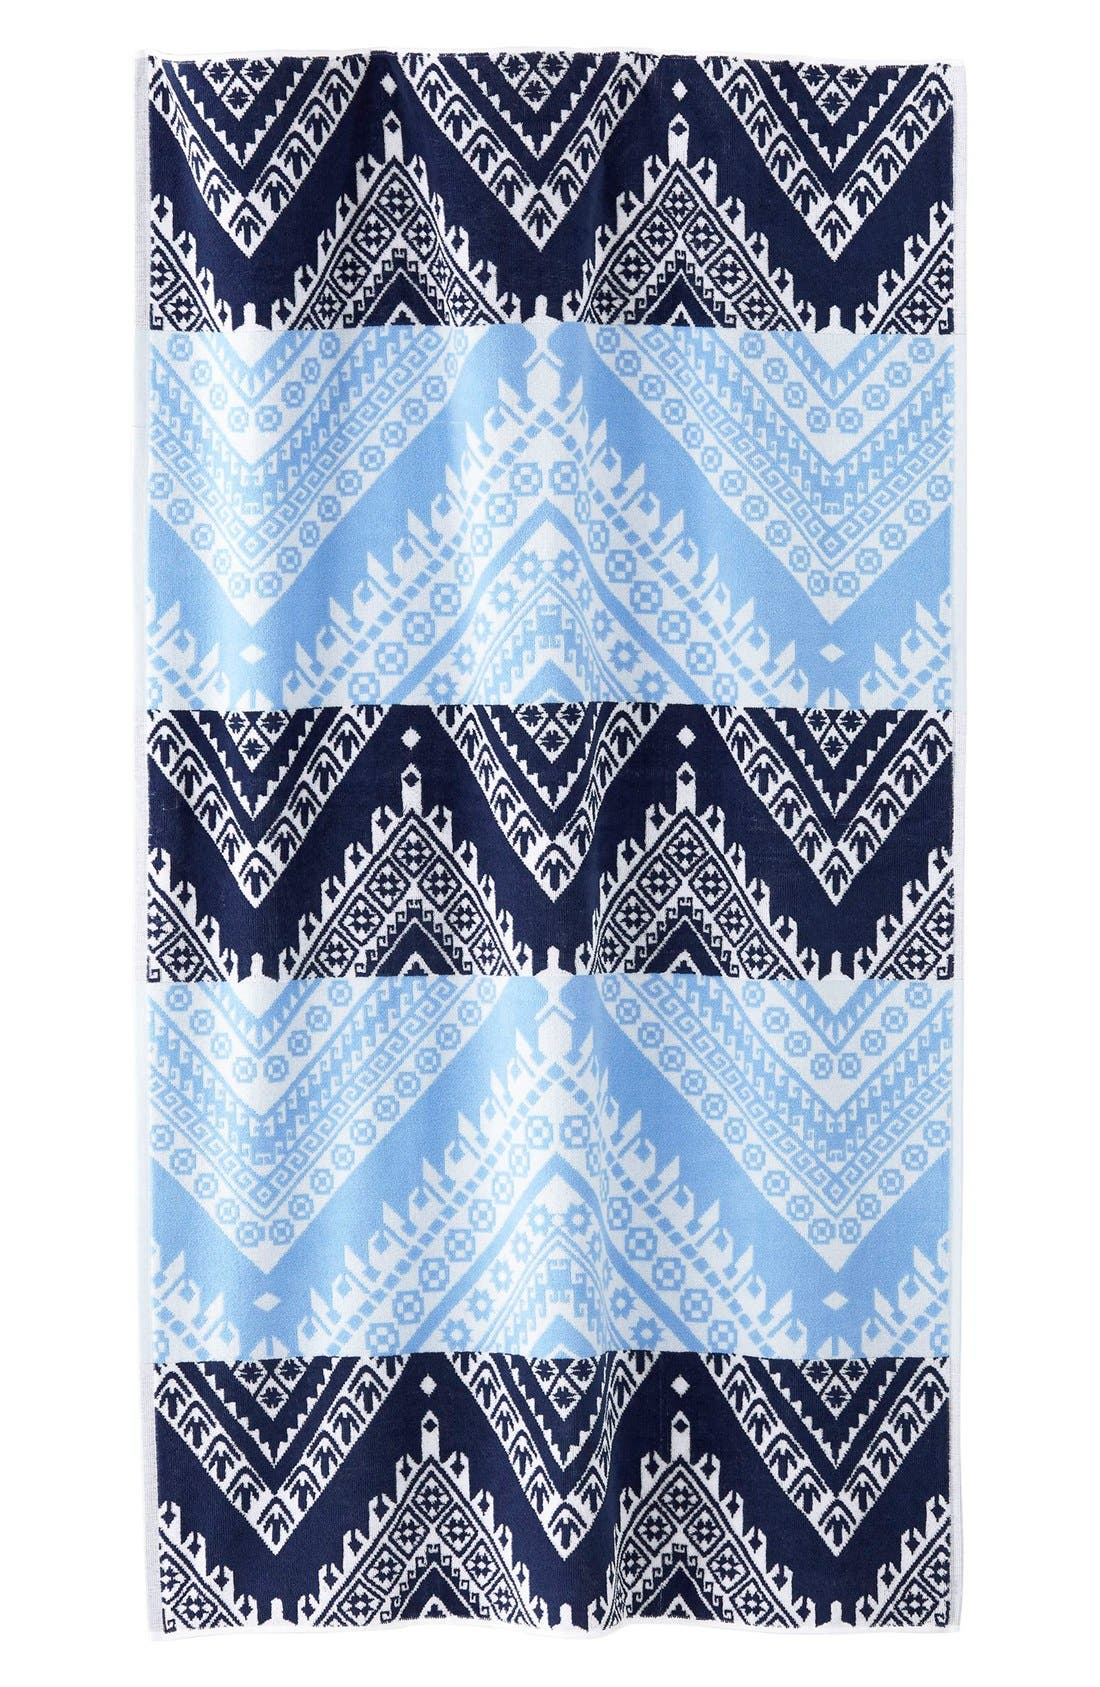 'Koh' Chevron Wave Pattern Beach Towel,                         Main,                         color, 400